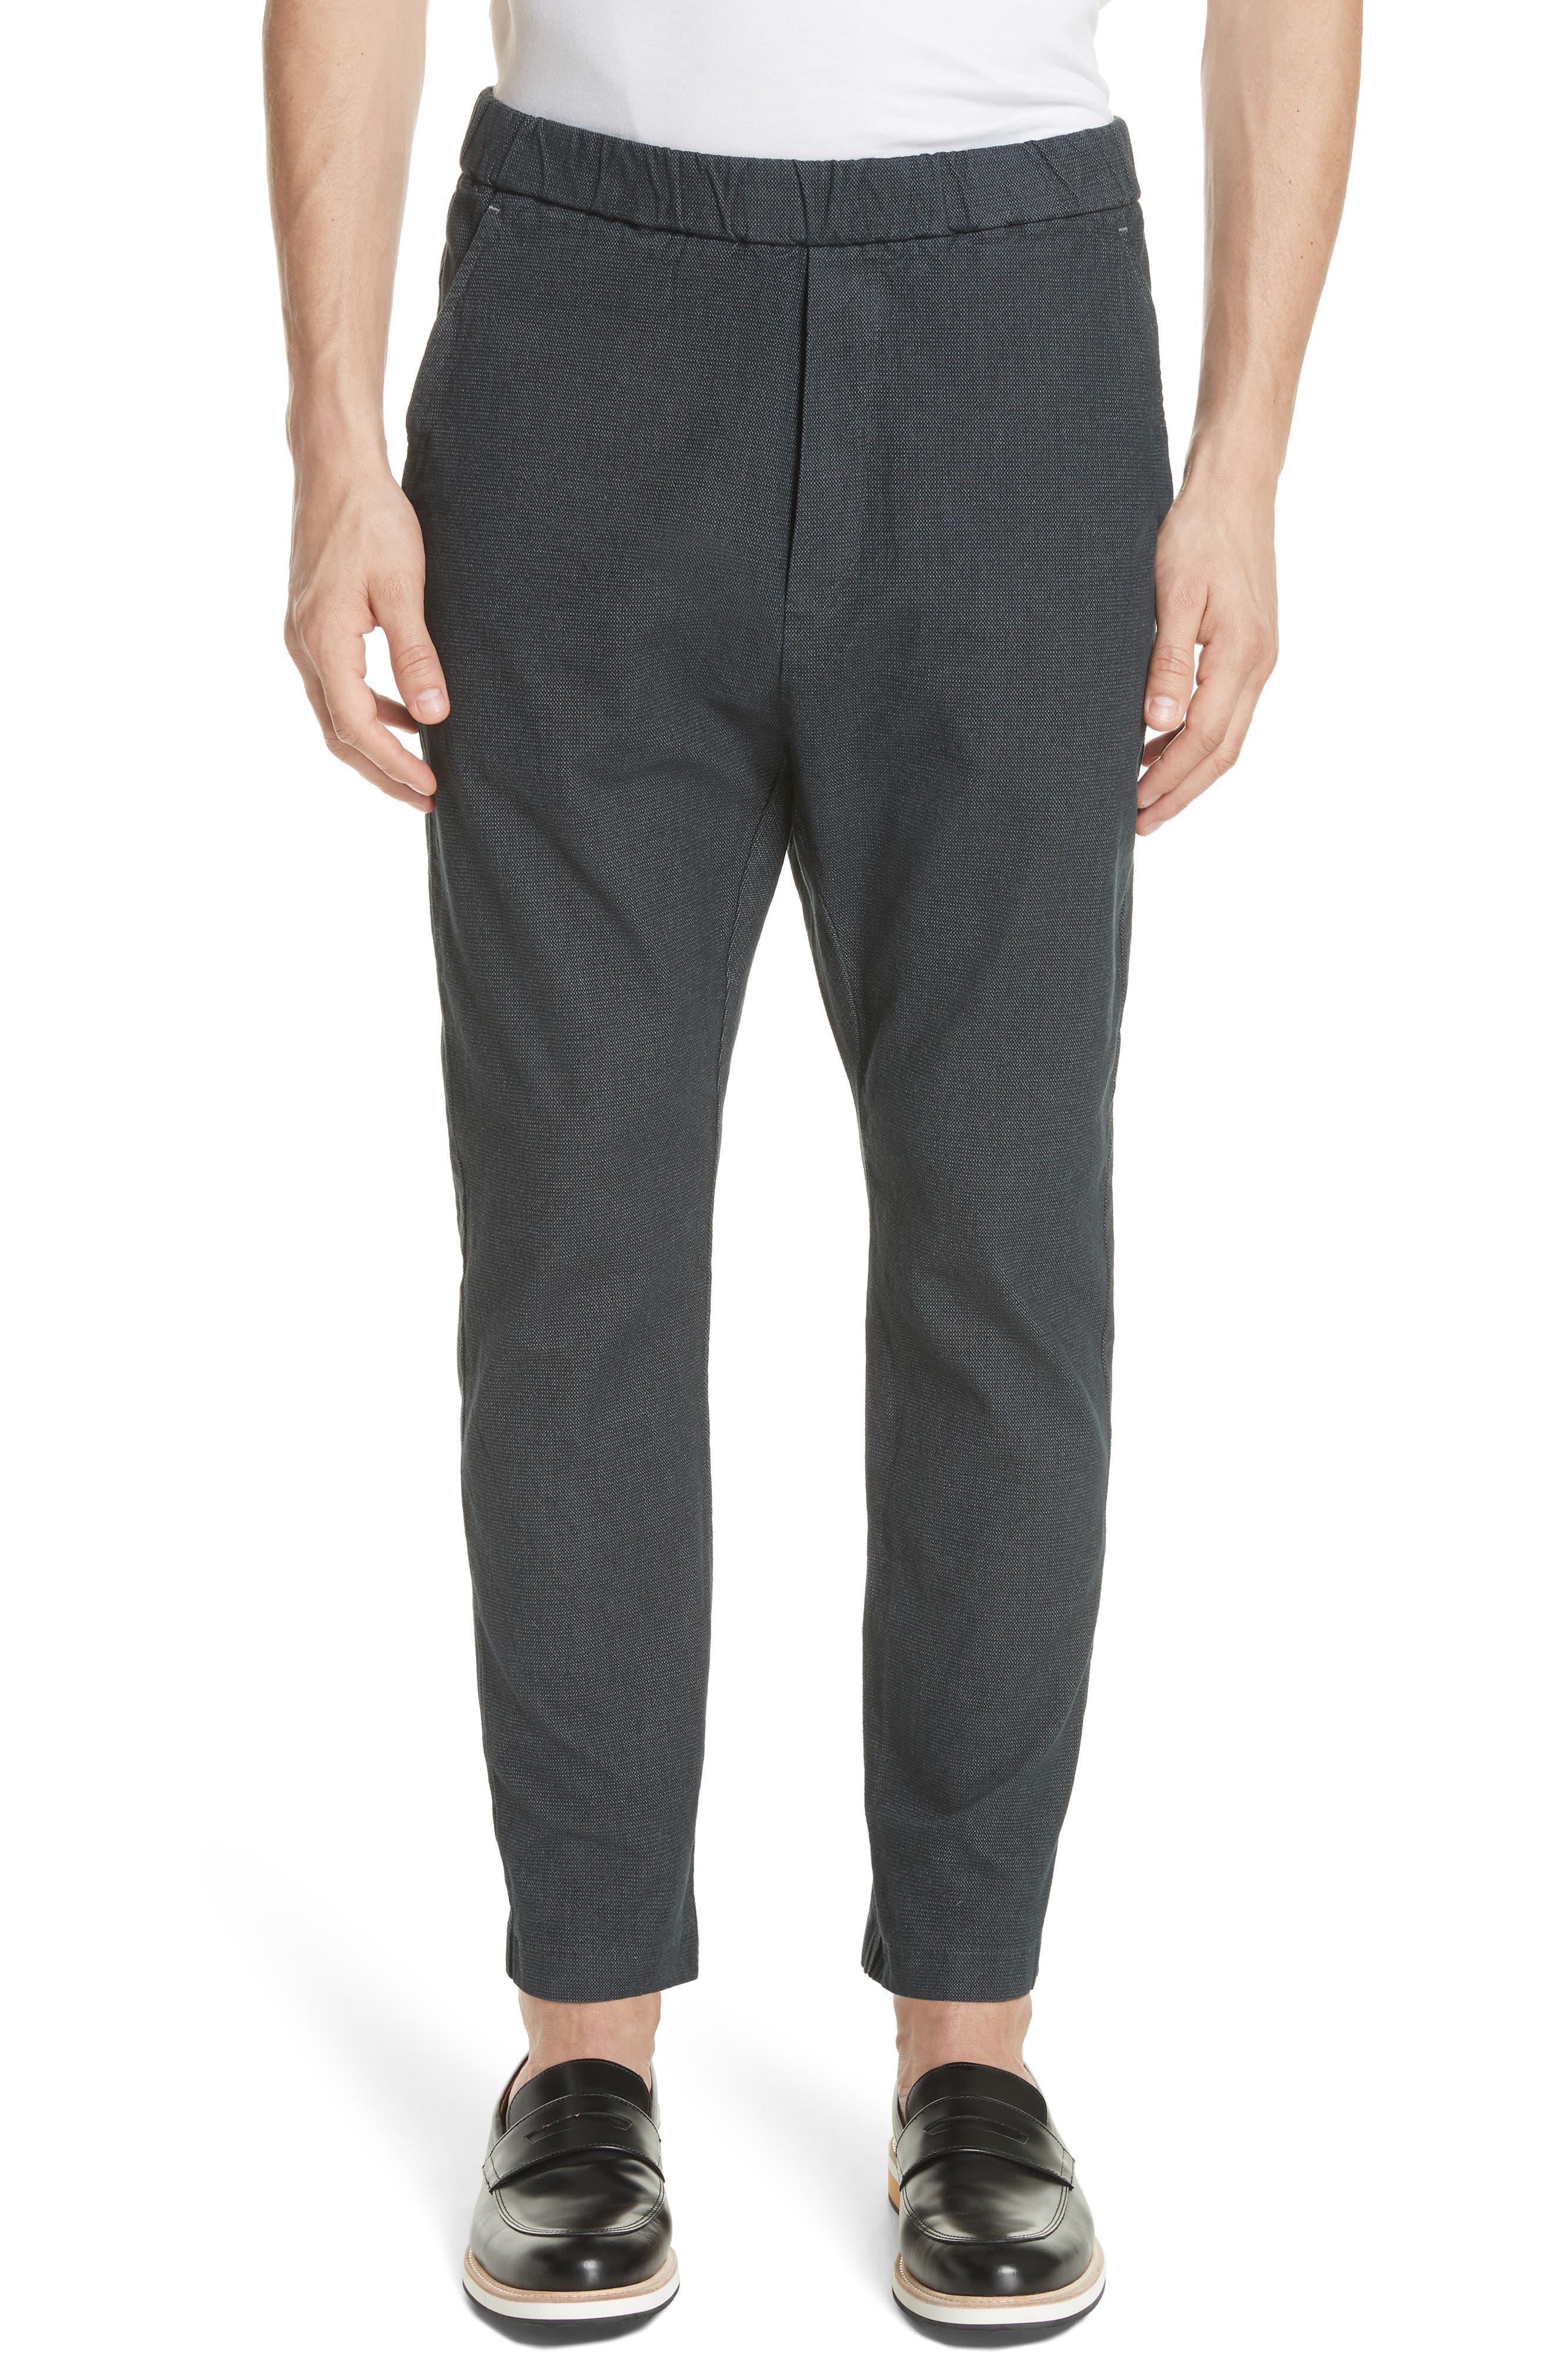 Aregna Ponto Trousers,                             Main thumbnail 1, color,                             020